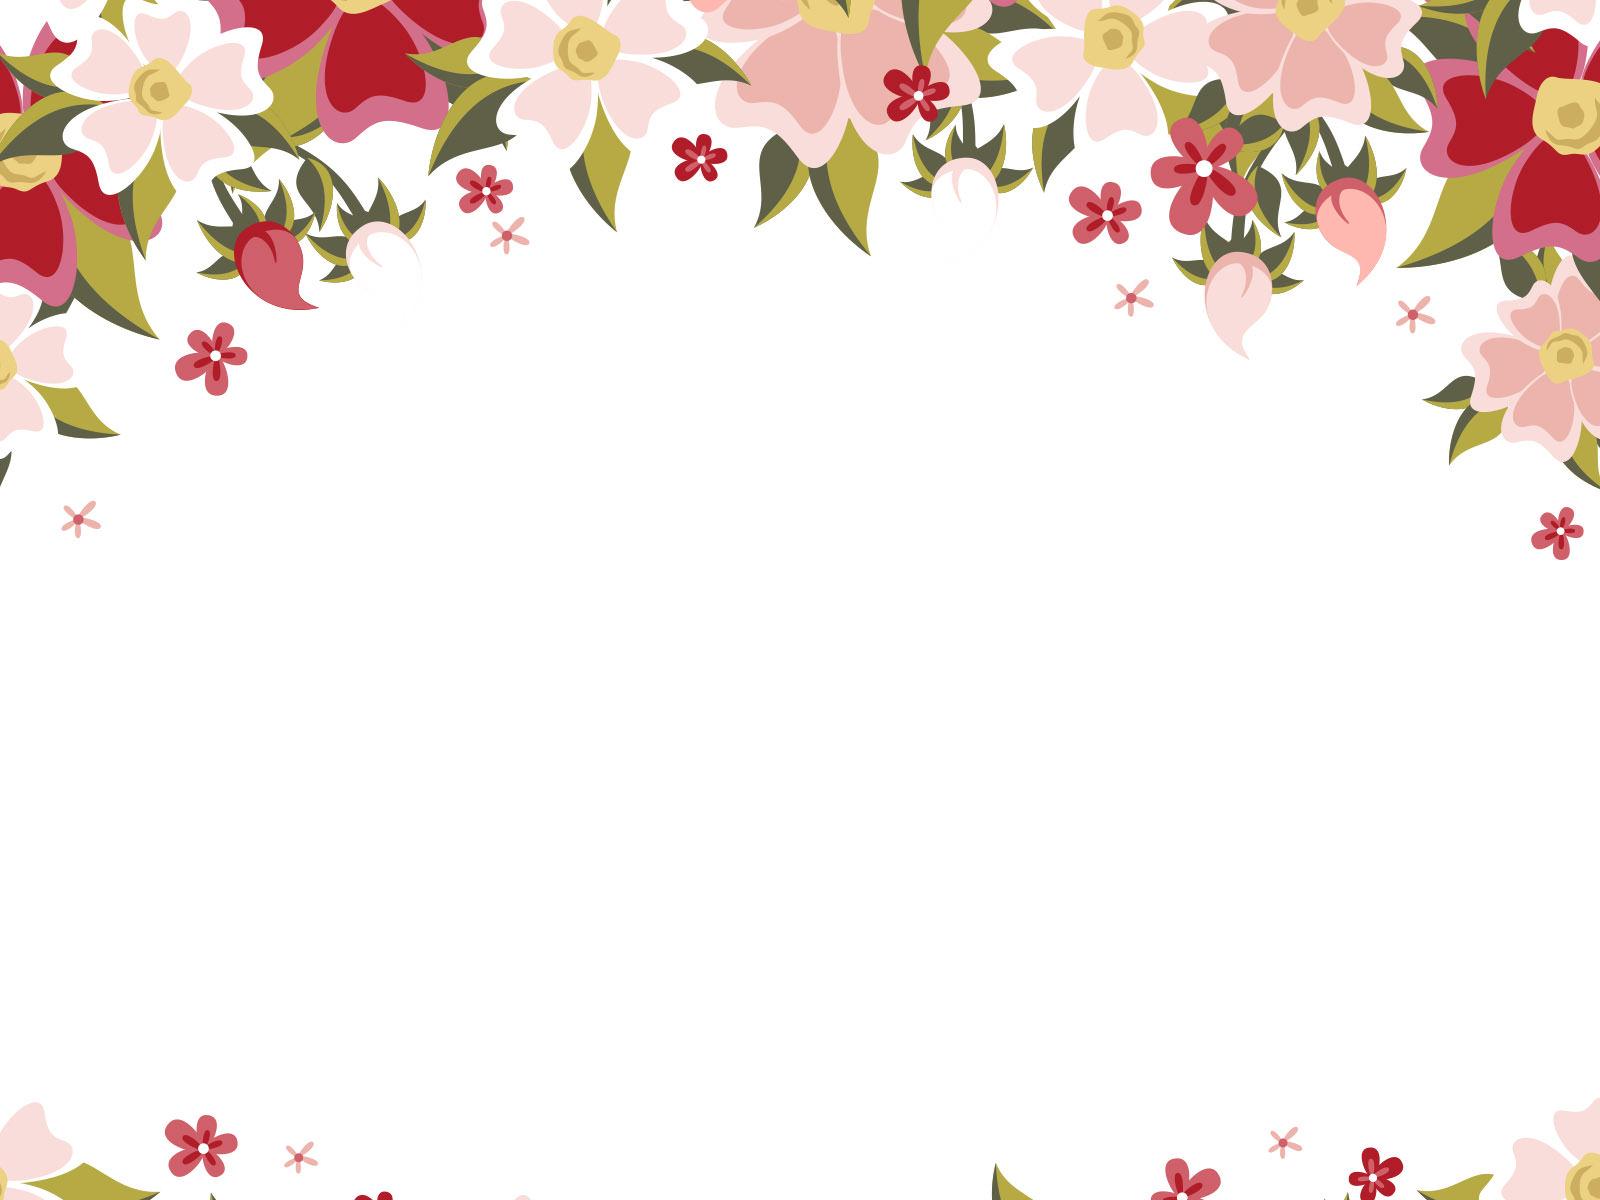 Hình nền PowerPoint hoa lá cành